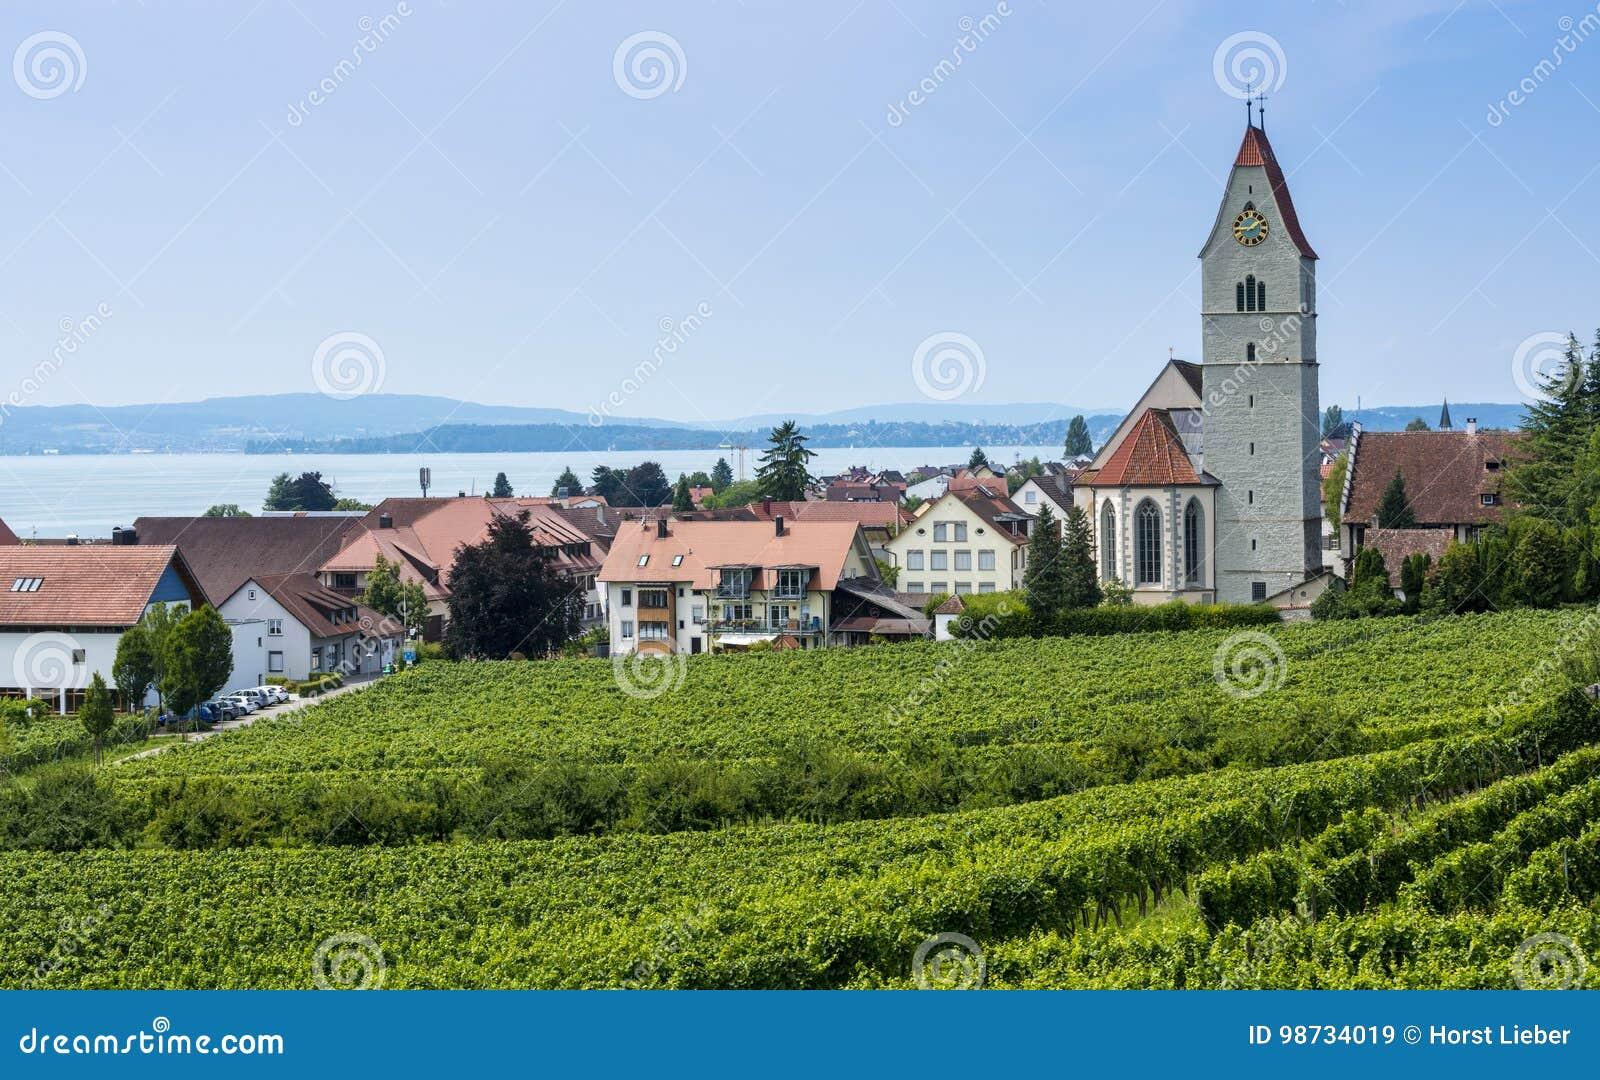 Hagnau - lago Constance, Baden-Wuerttemberg, Alemanha, Europa